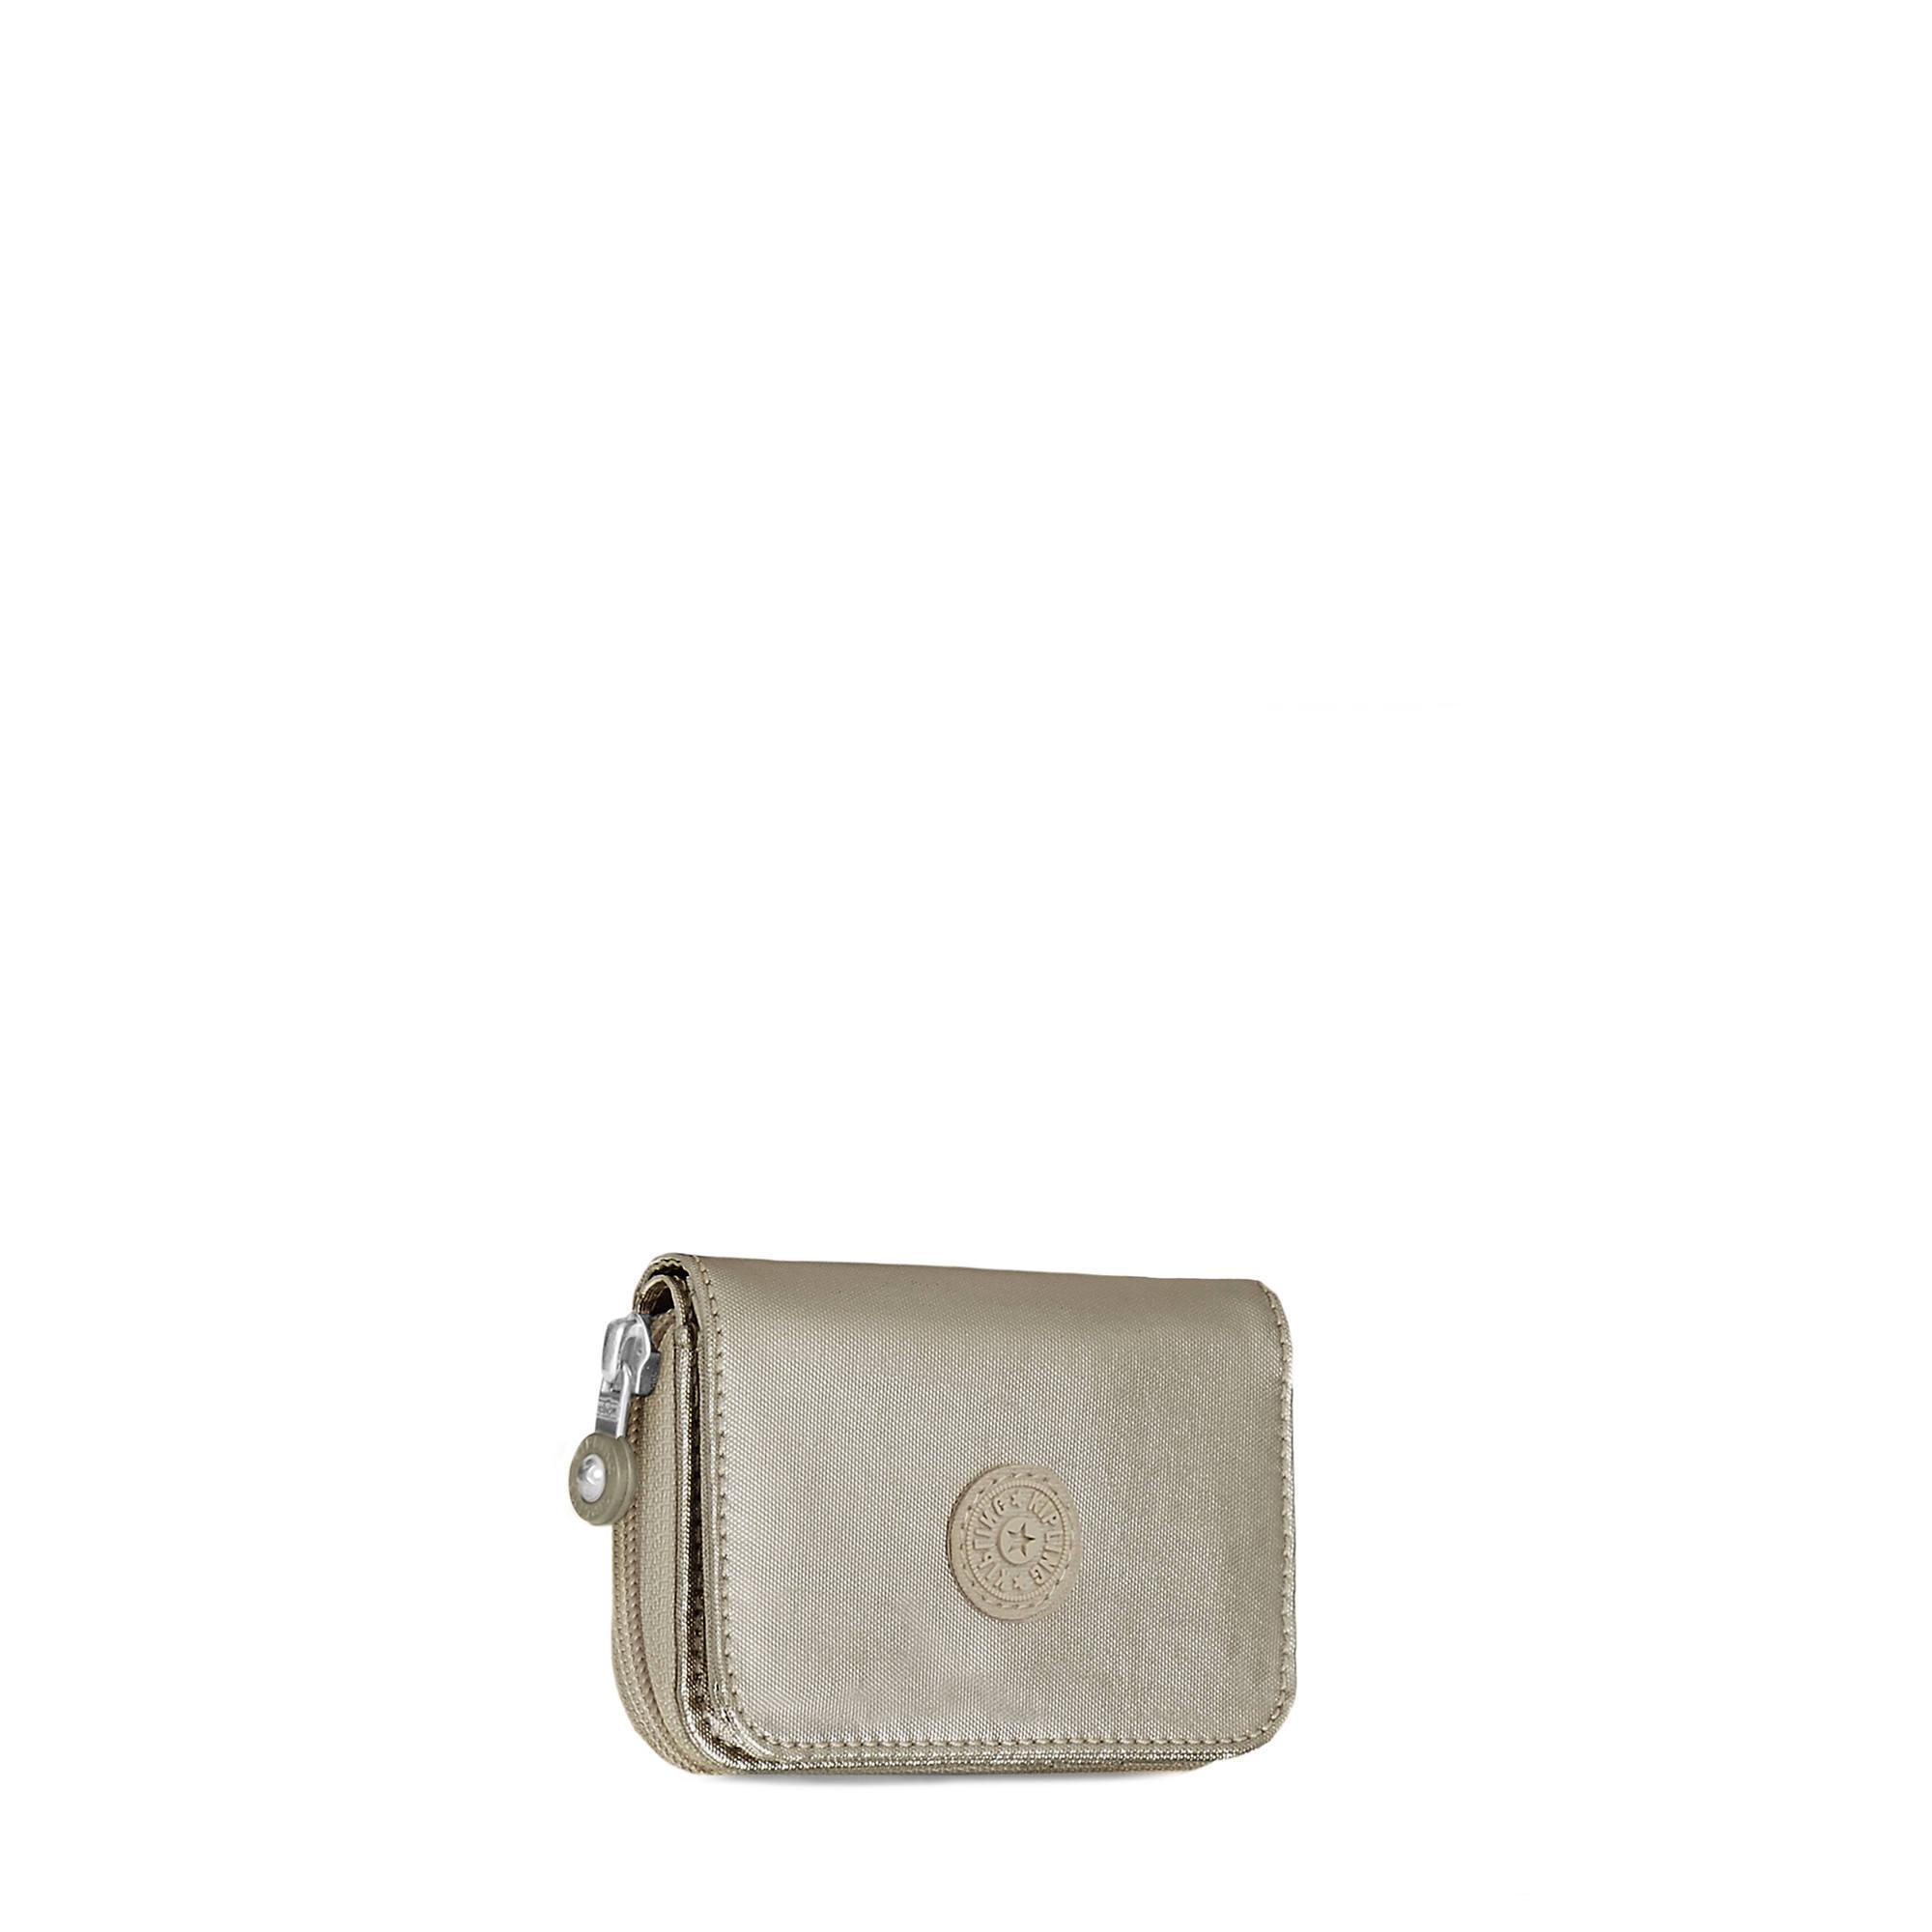 2cc4942fffd Kipling-Tops-Wallet thumbnail 8